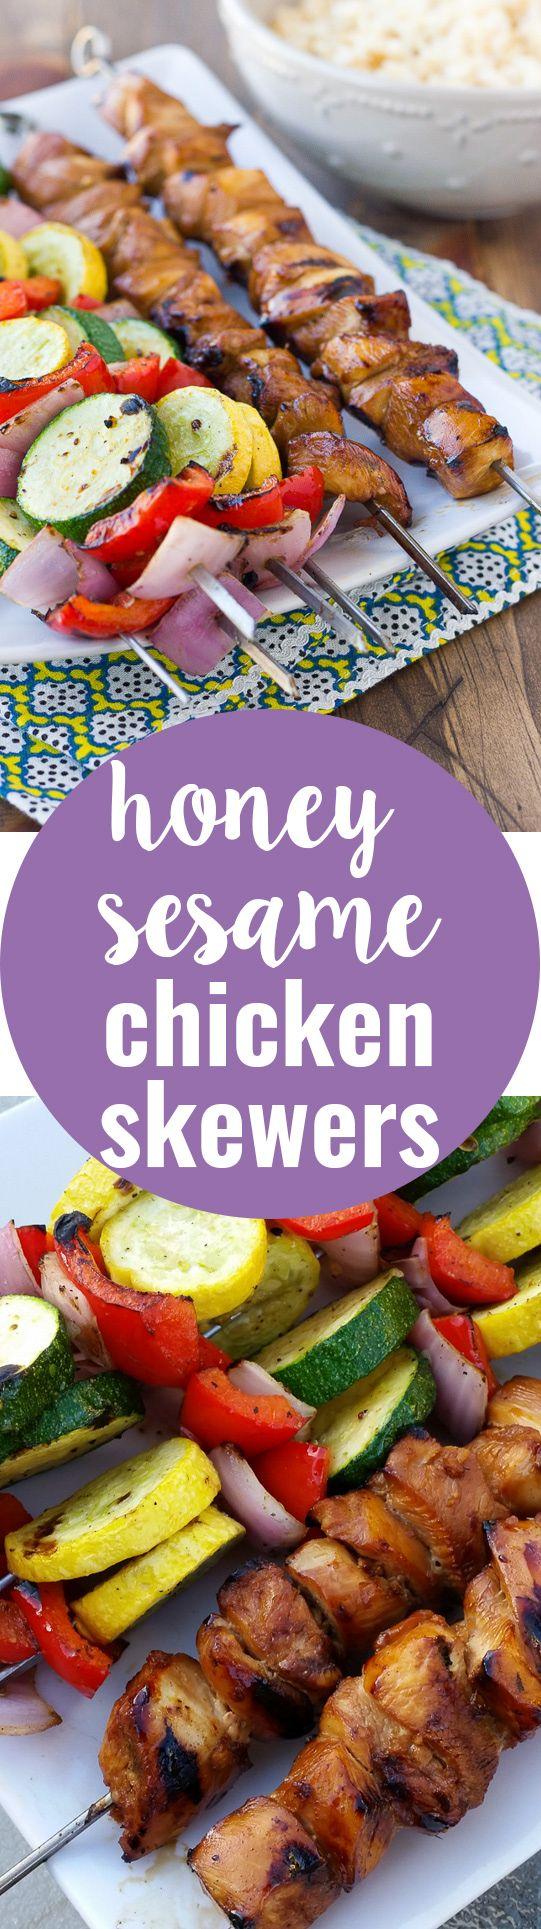 how to make honey sesame chicken